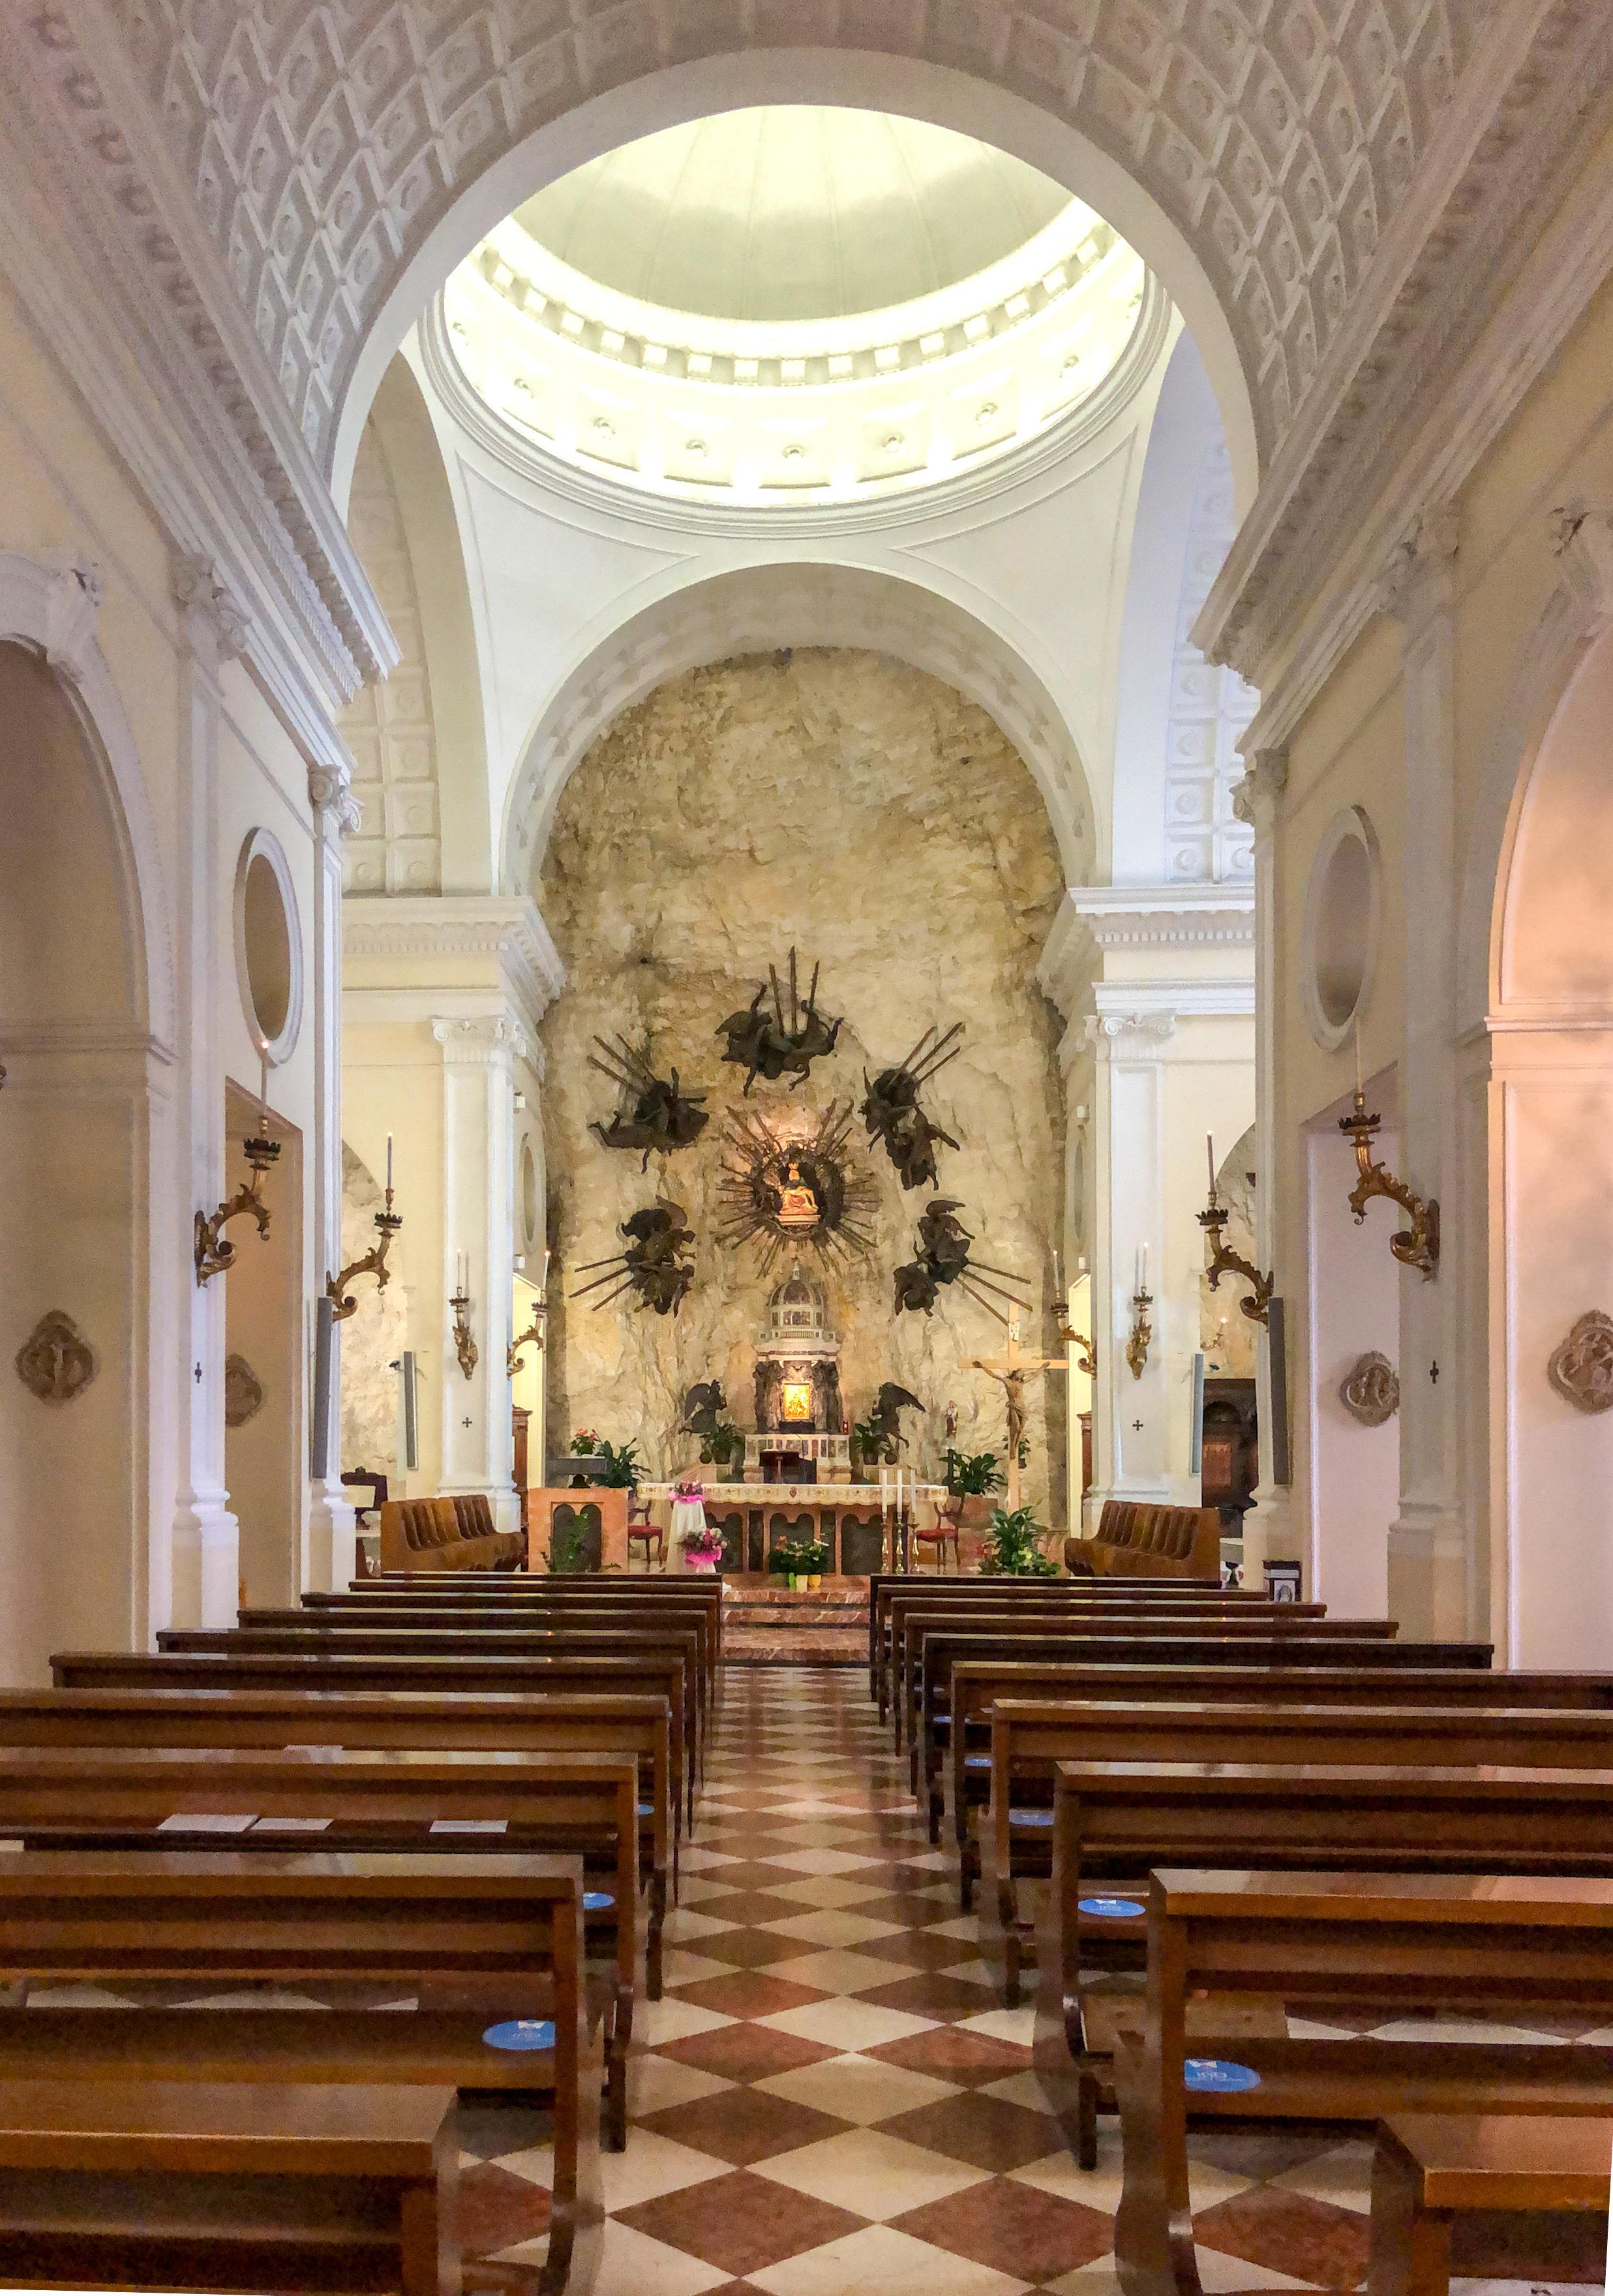 Italia - Italy - Casale Management - Travel - Veneto - Ferrara di Monte Baldo - Verona - Lago di Garda - Santuario Madonna della Corona - Interno del Santuario